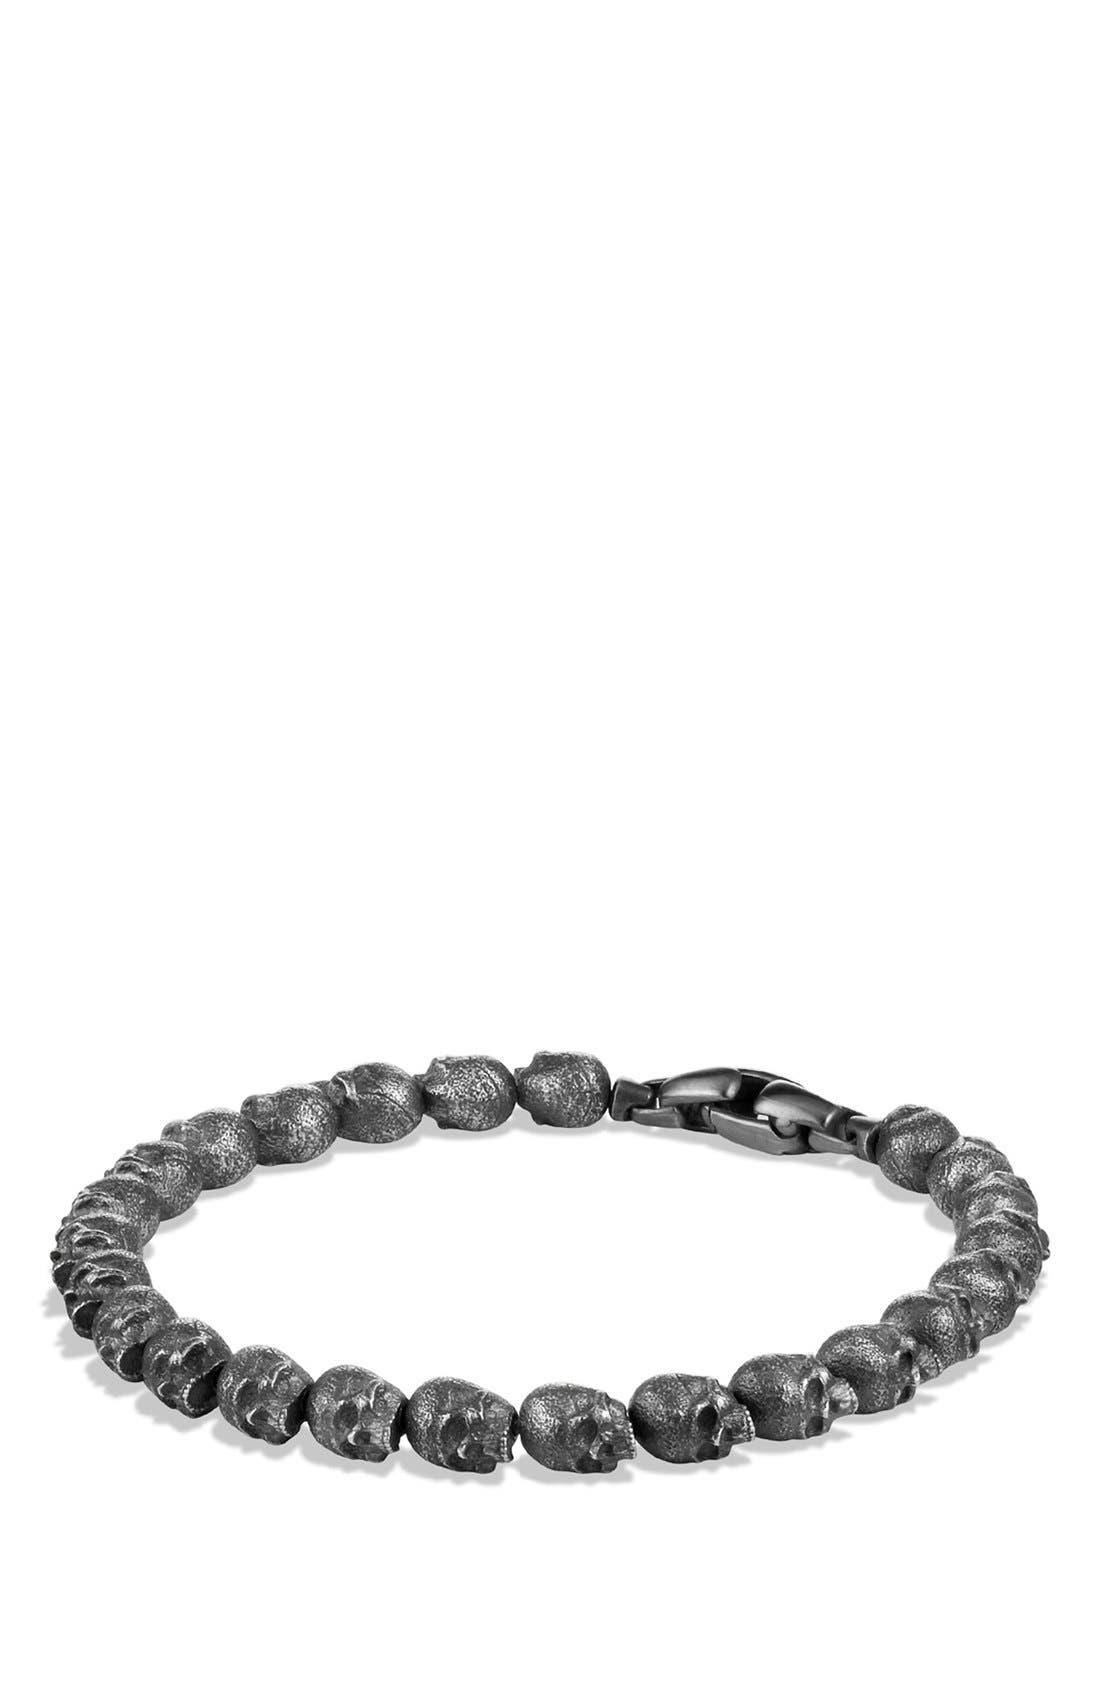 'Spiritual Beads' Bracelet in Silver,                             Main thumbnail 1, color,                             040